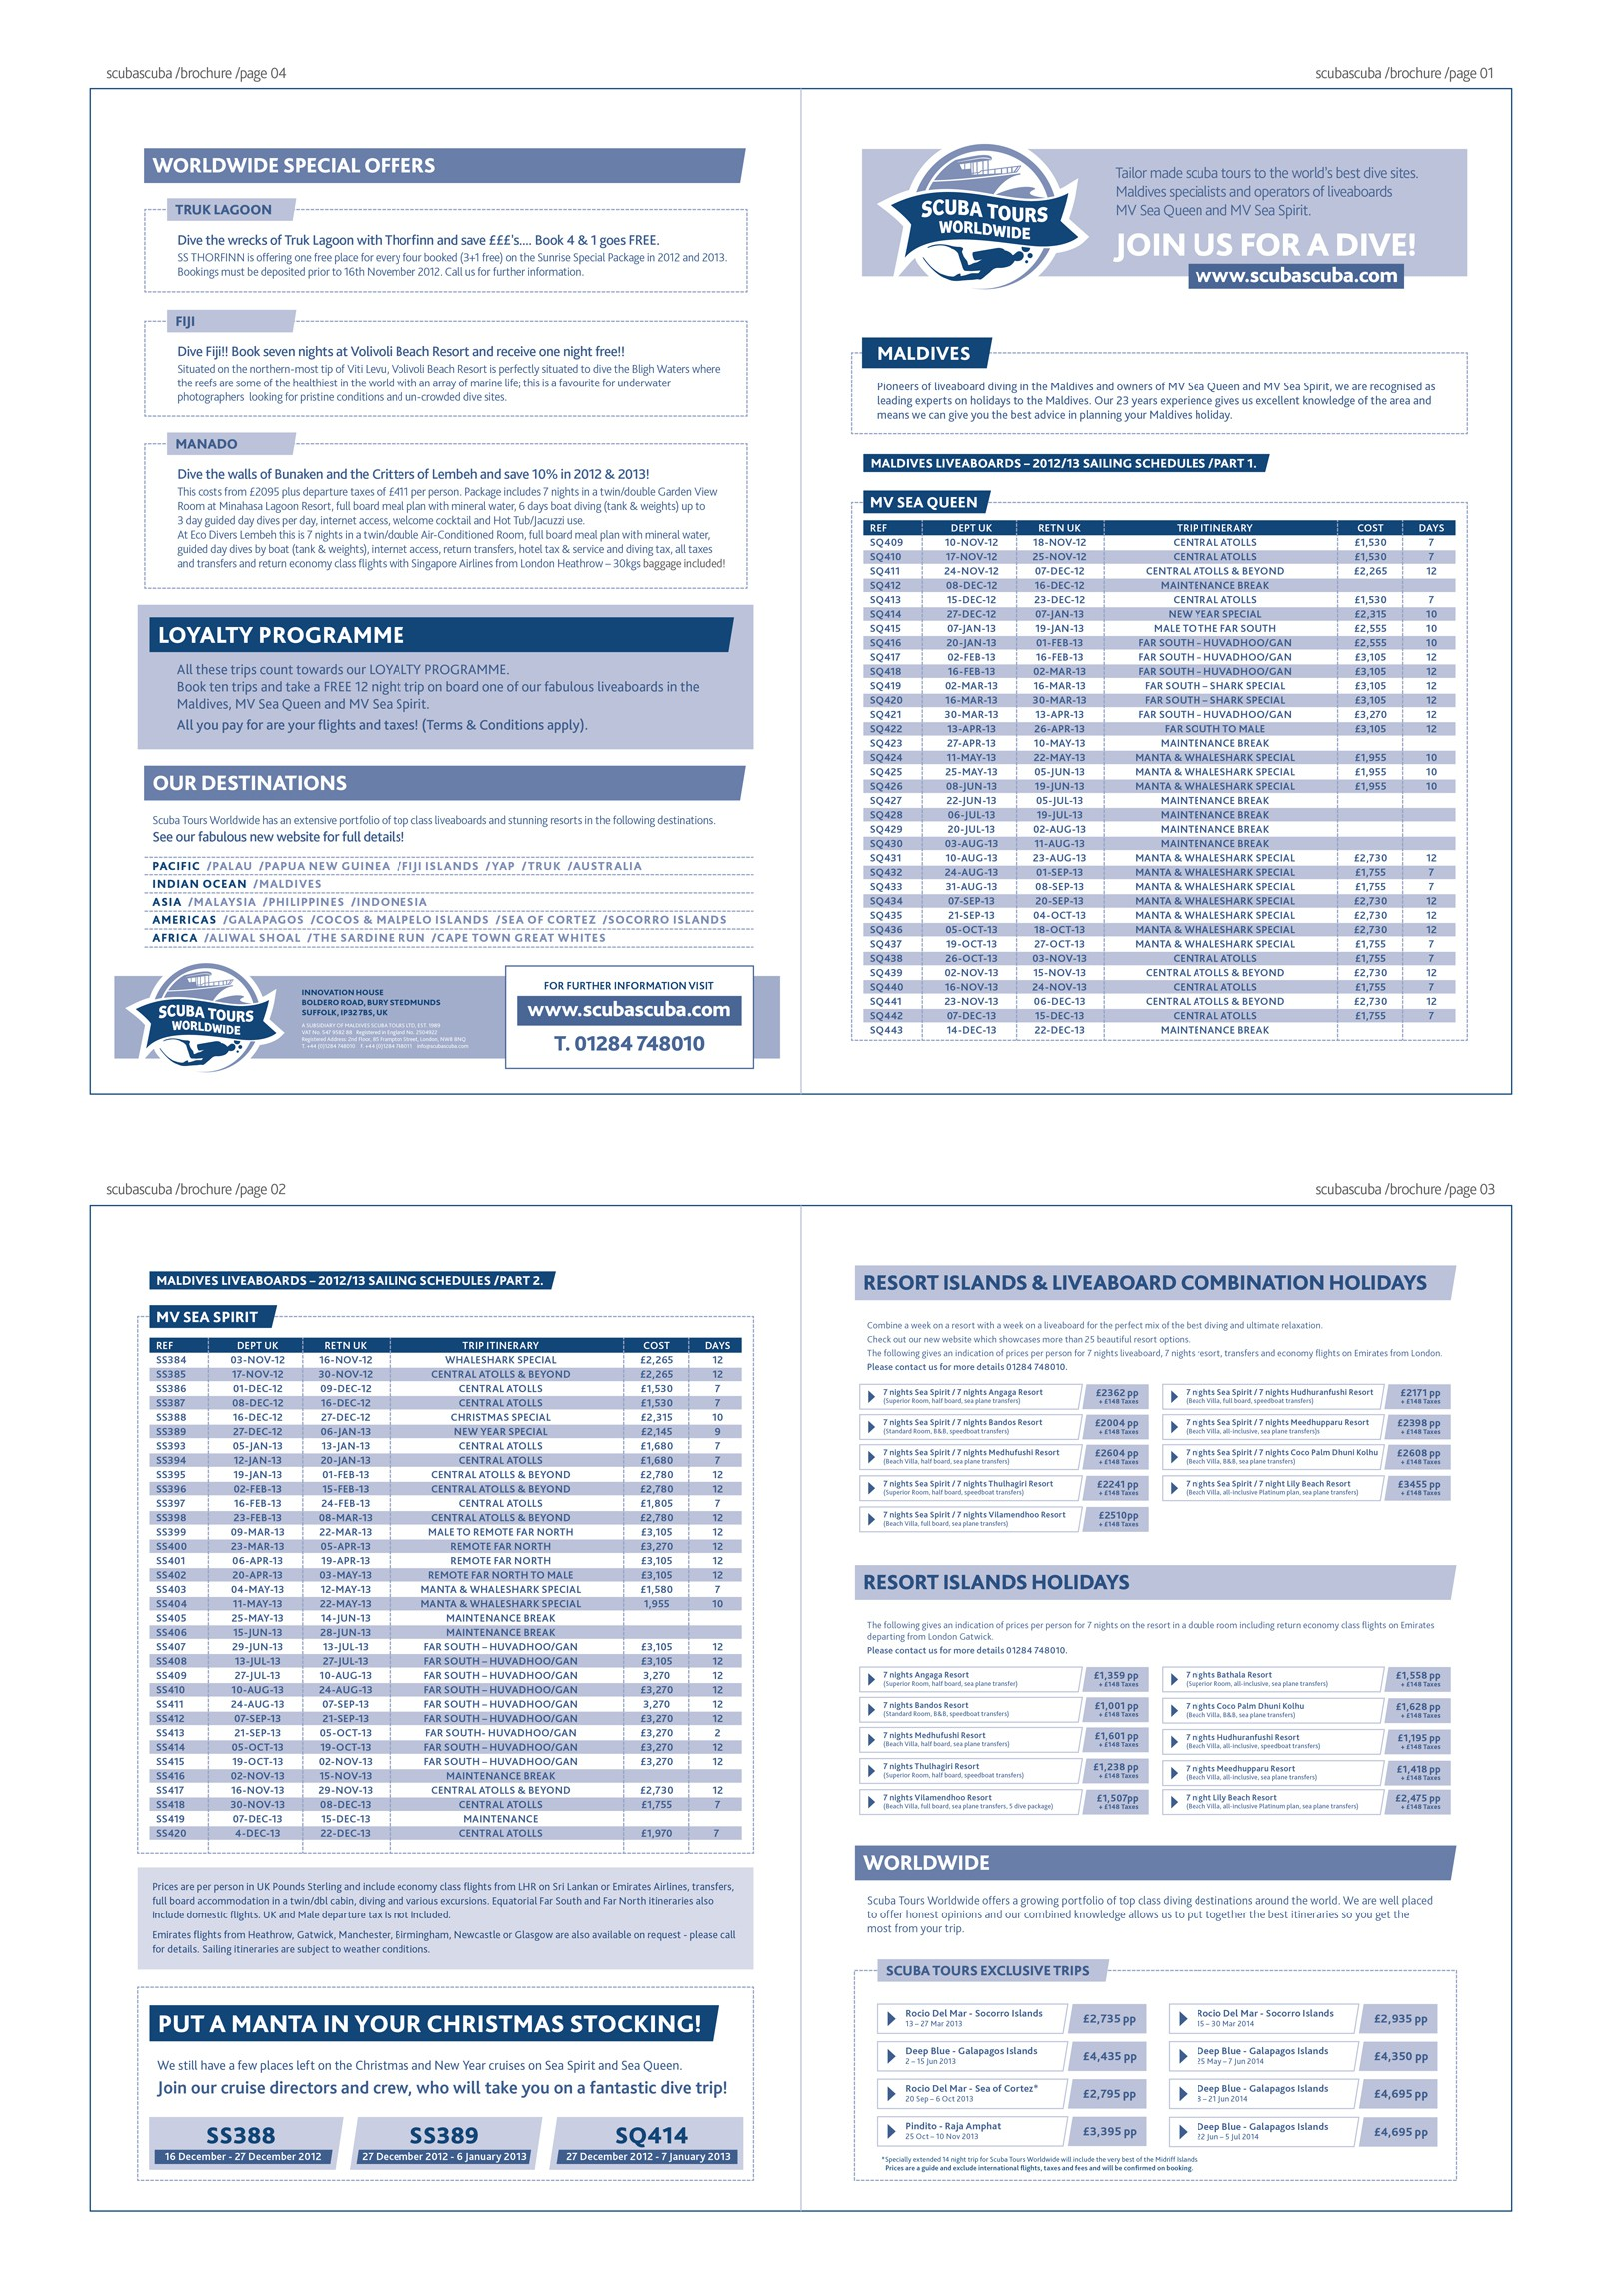 Scuba diving company needs text organising into flyer - simple job !